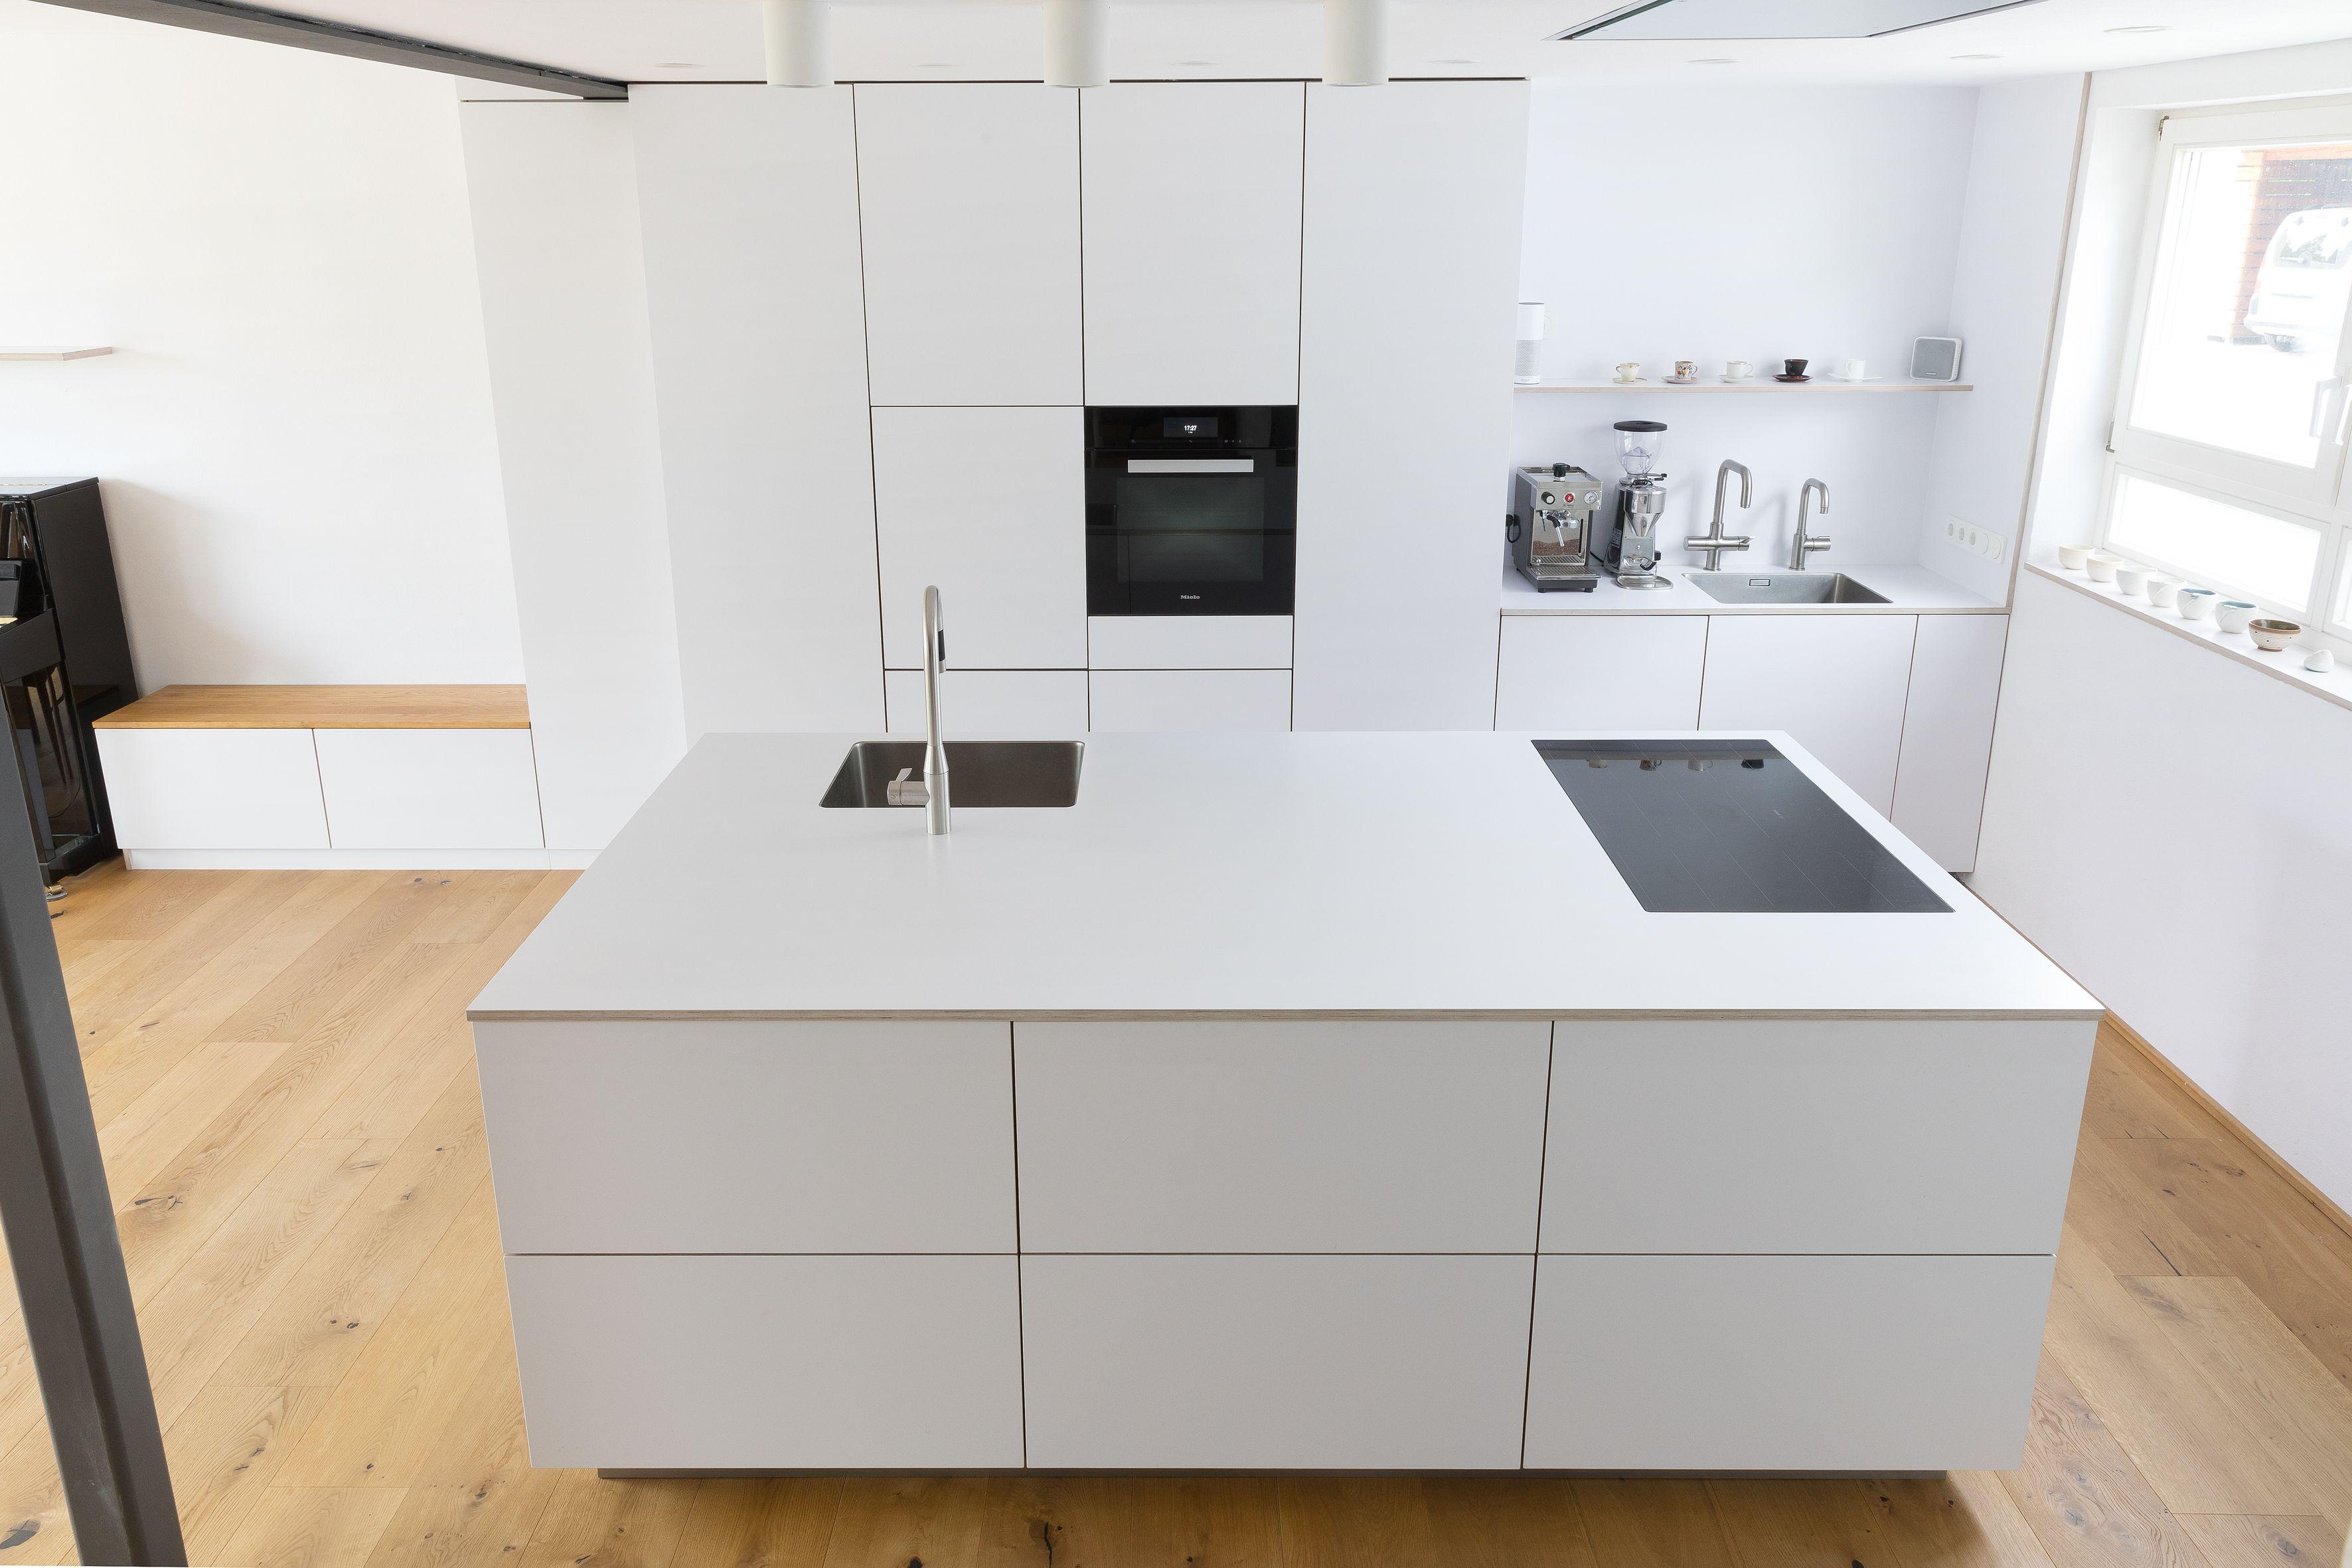 Cuisine blanche | Cuisine design | Cuisine mezzanine | Loft | Coin salon | Plan de cuisine | …